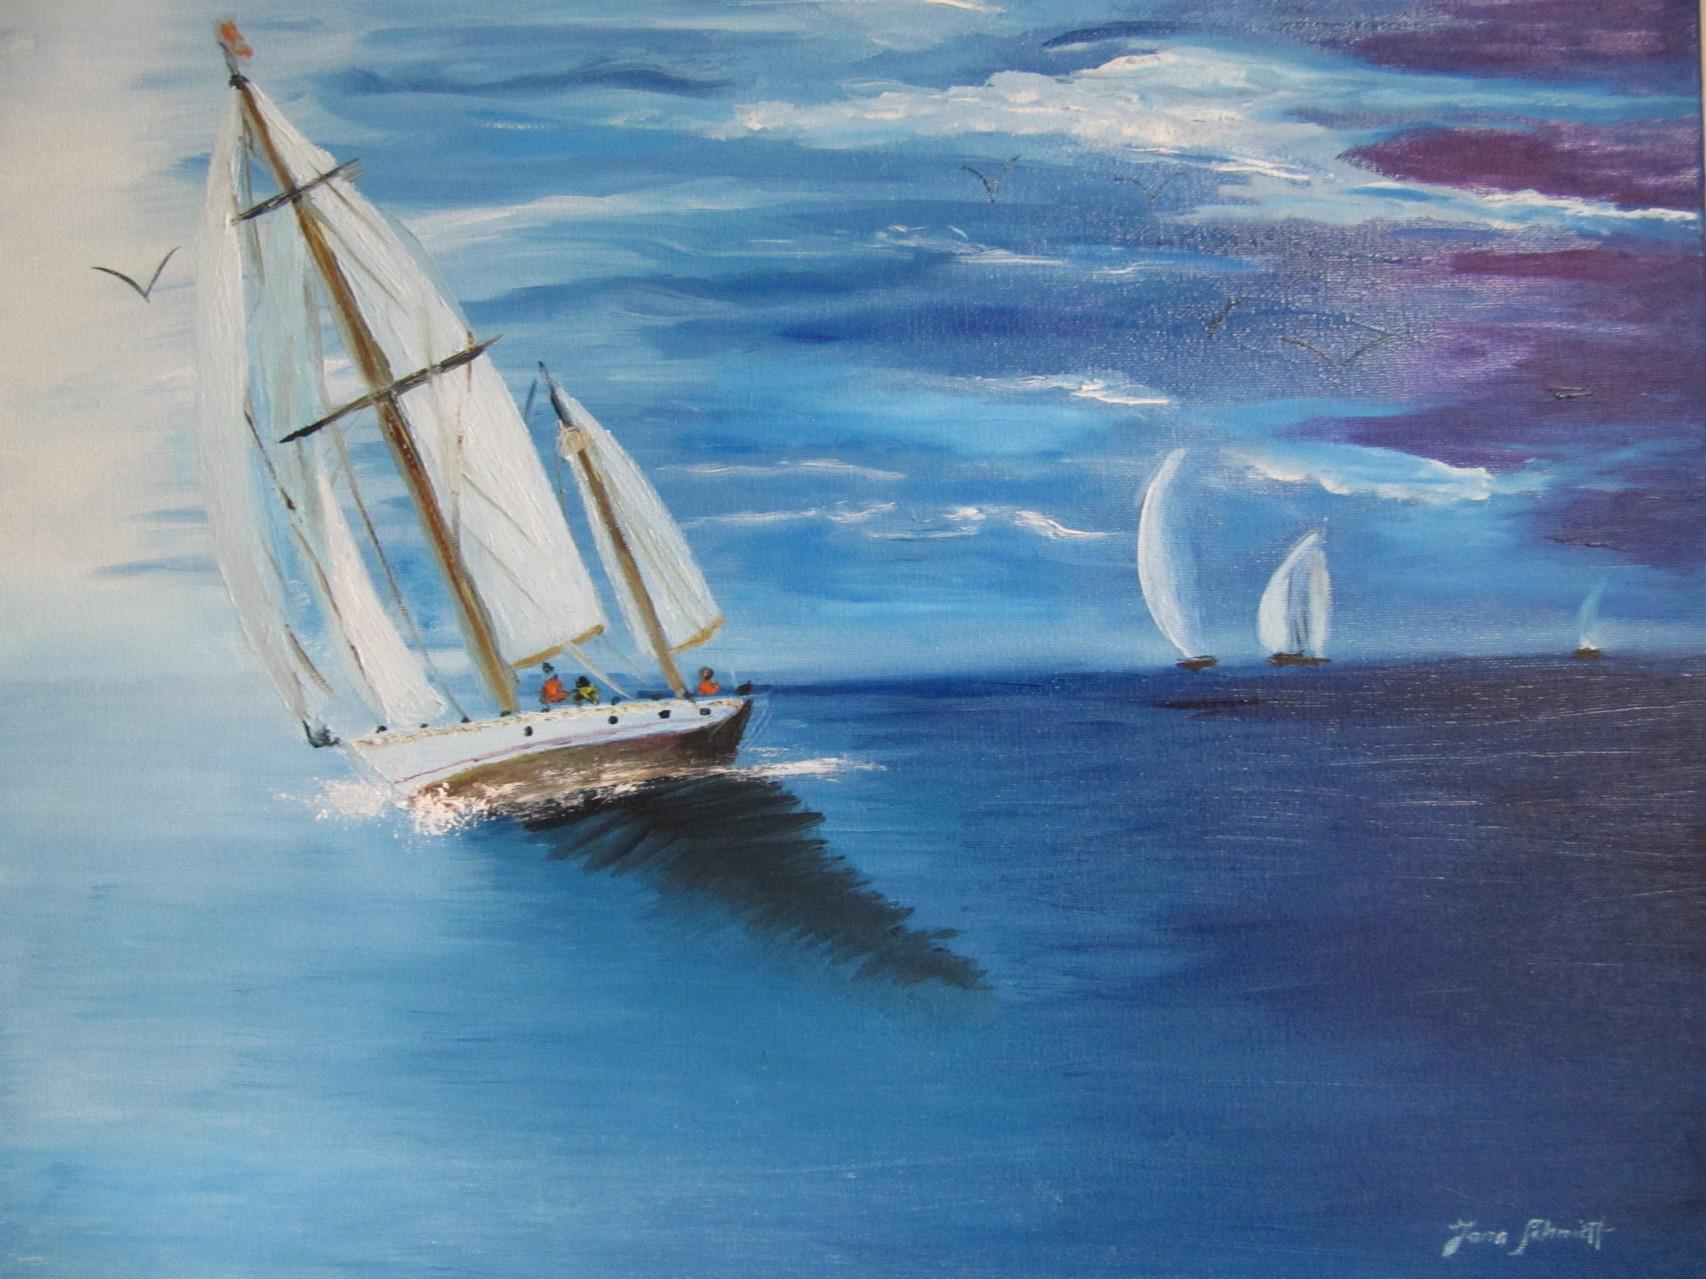 Sailing II 40 x 50 Öl auf Leinwand